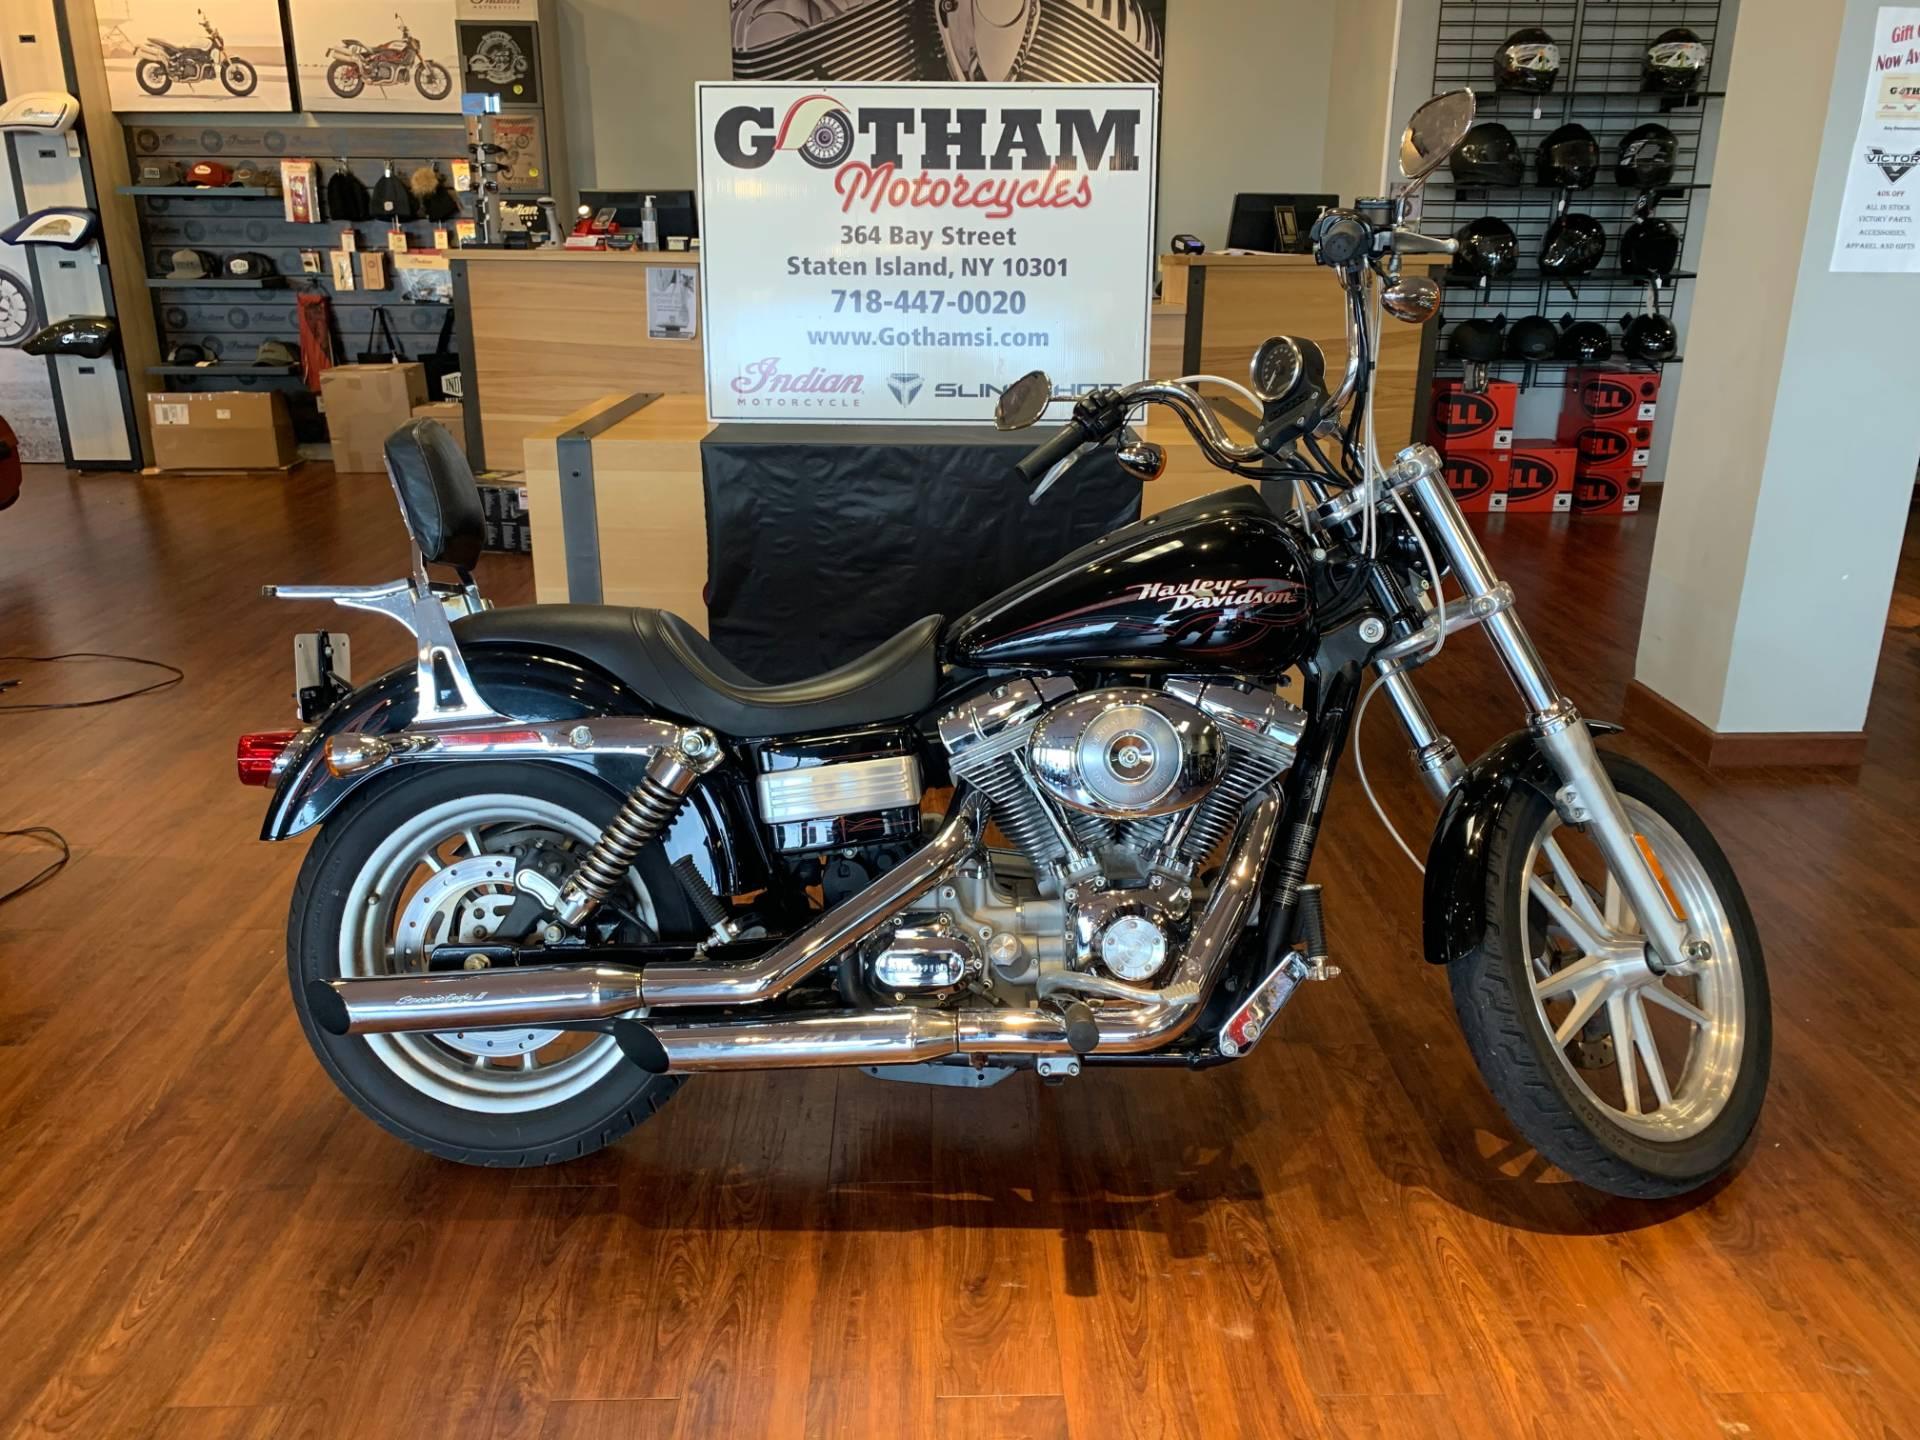 2006 Harley Davidson Dyna Super Glide Custom Motorcycles Staten Island New York 323236